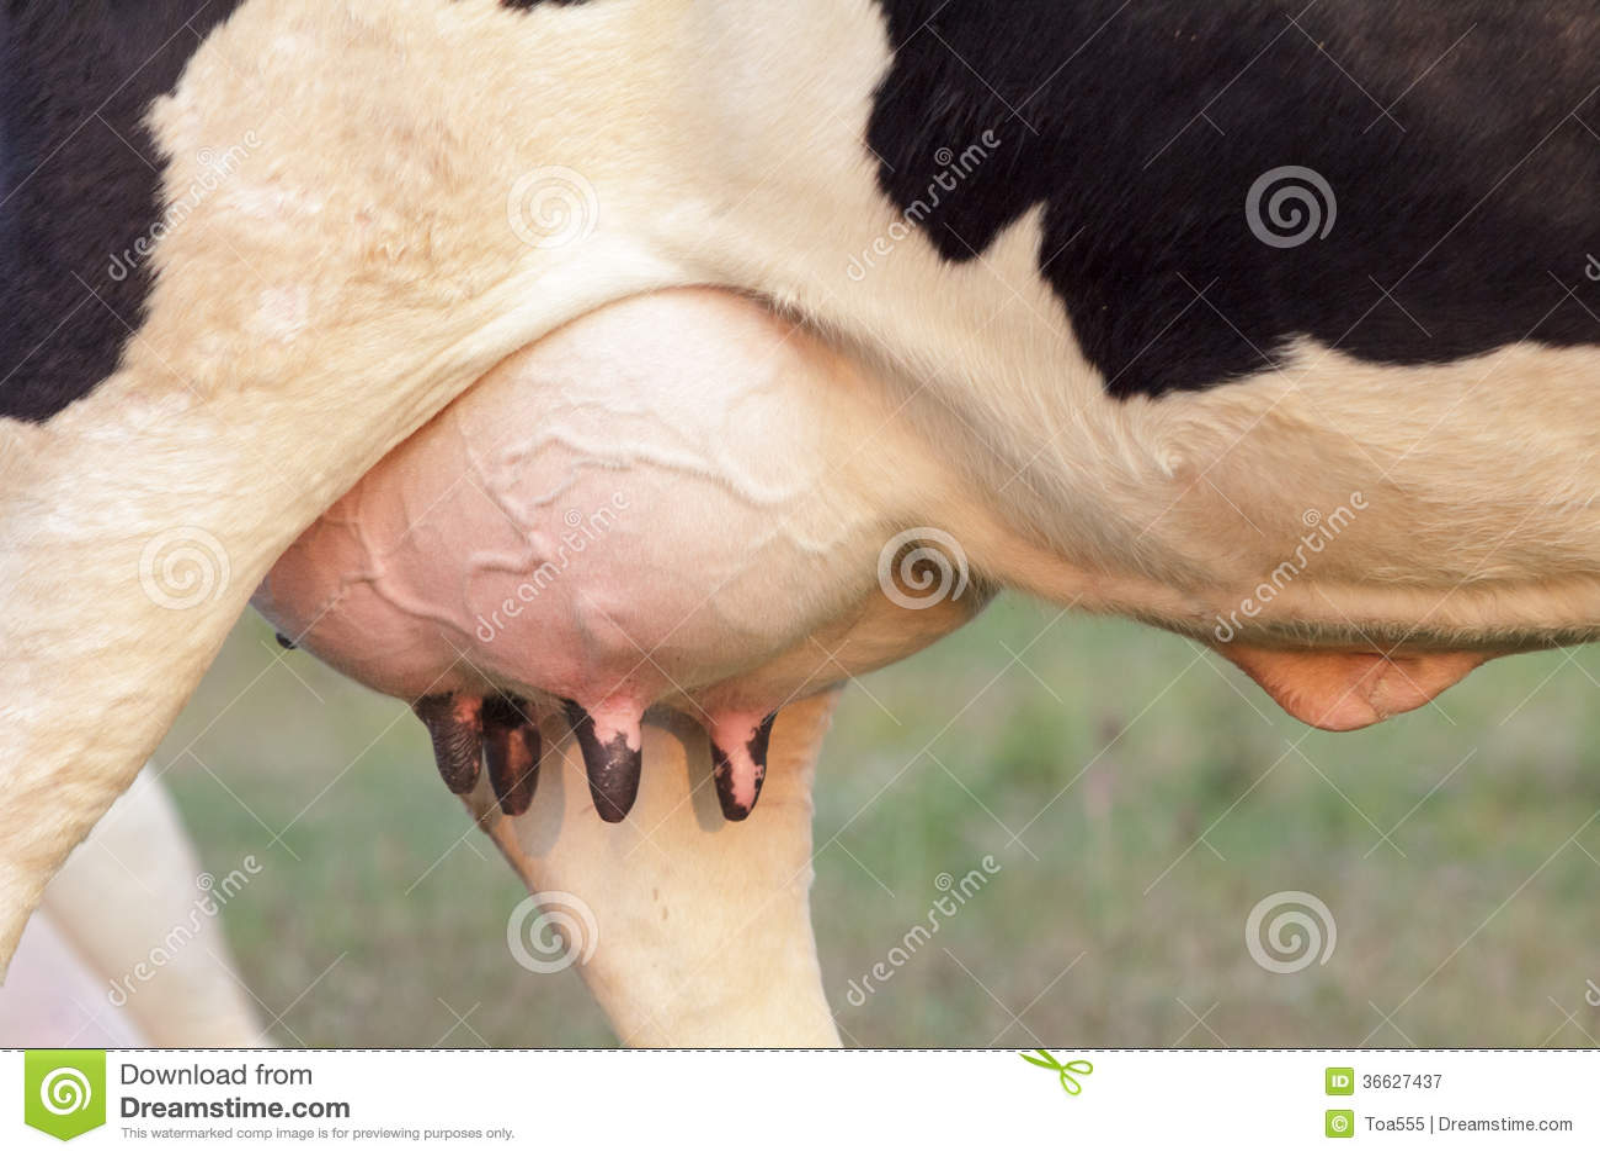 holstein cow big udder full of milk stock image image of closeup